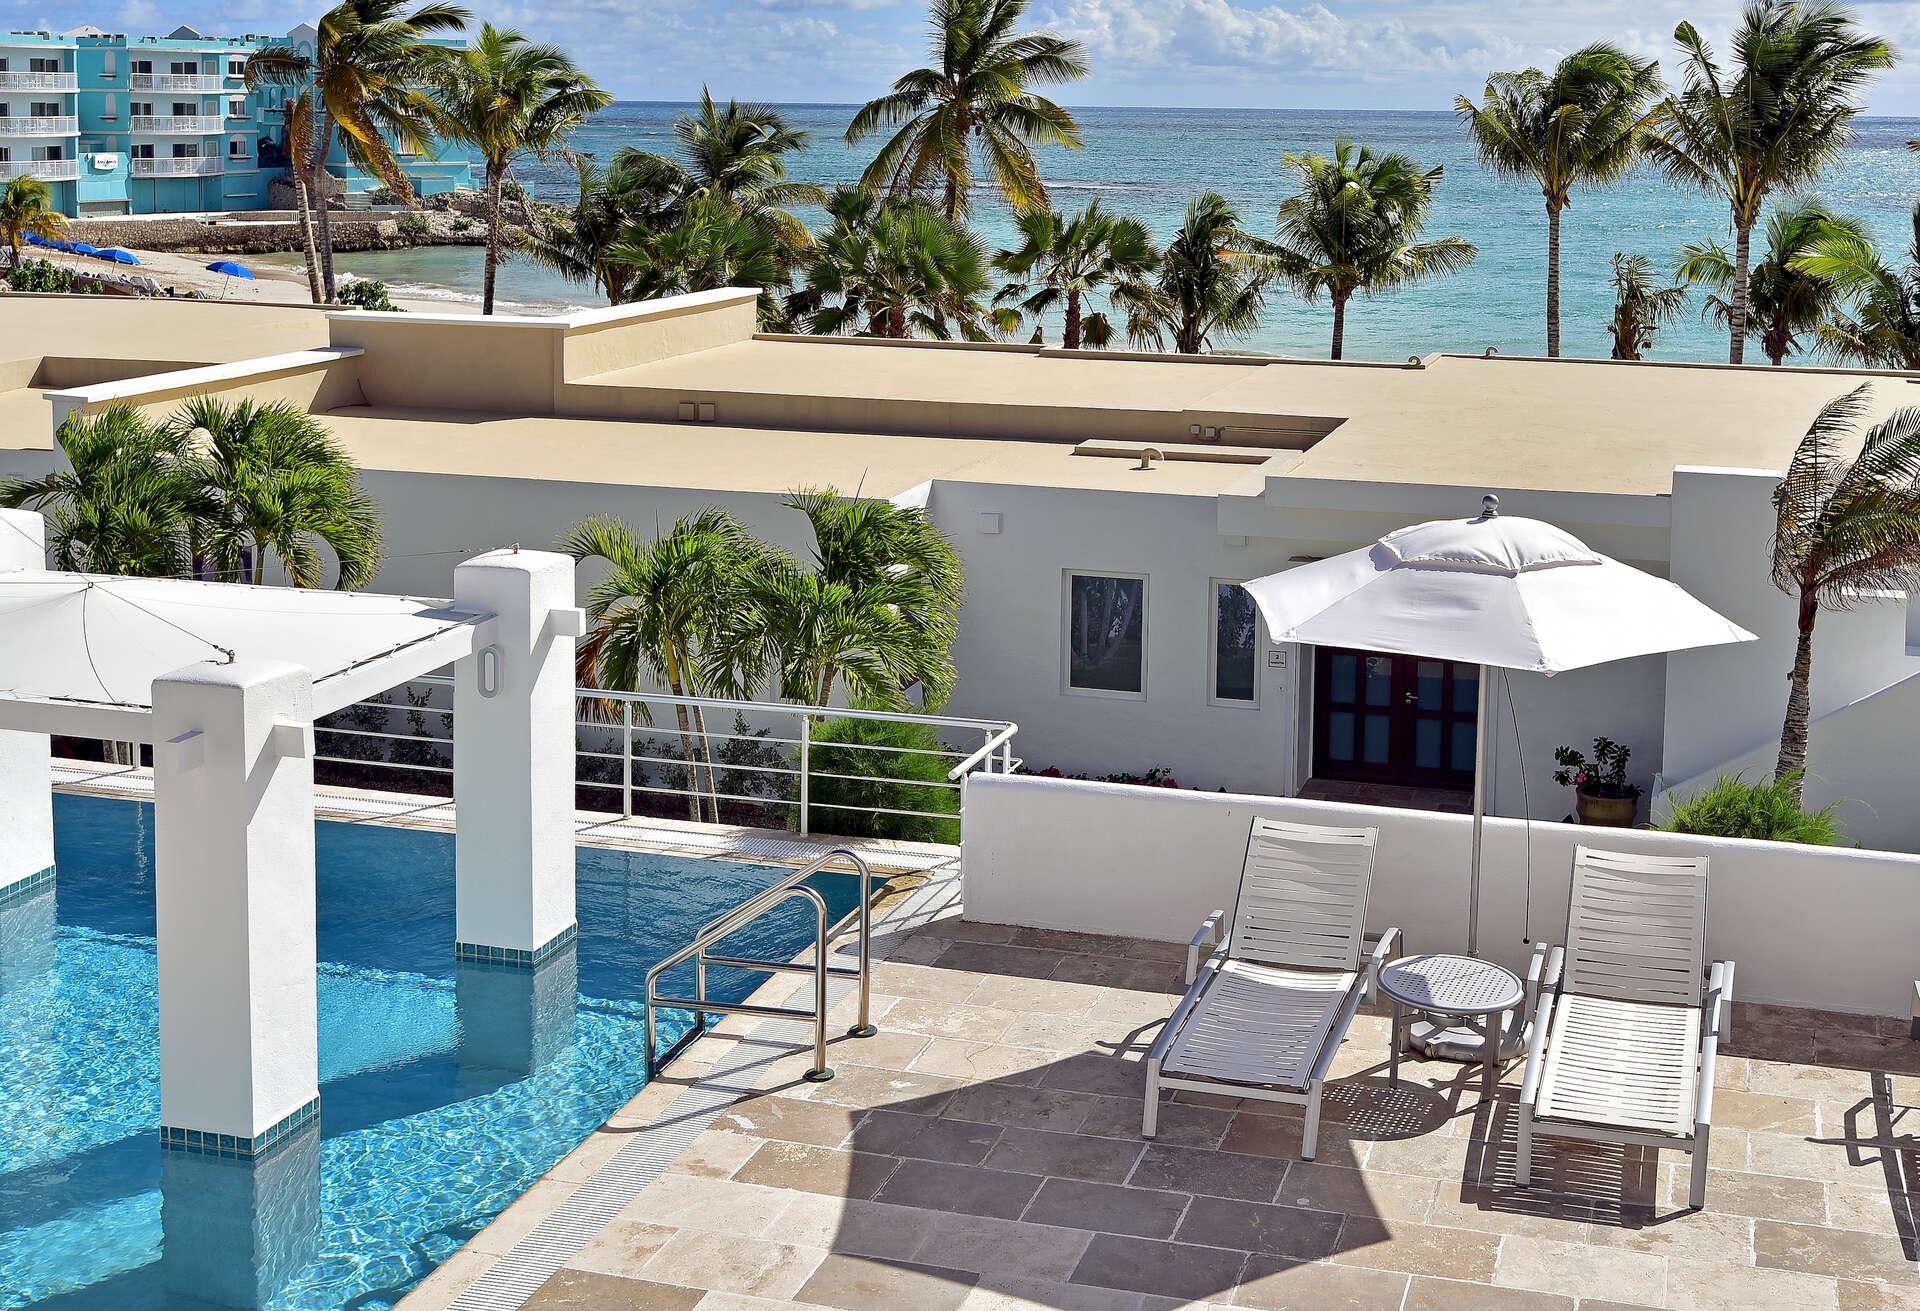 Luxury villa rentals caribbean - St martin - Sint maarten - Coral beach club - 3 BDM Beachview Villa - Image 1/24